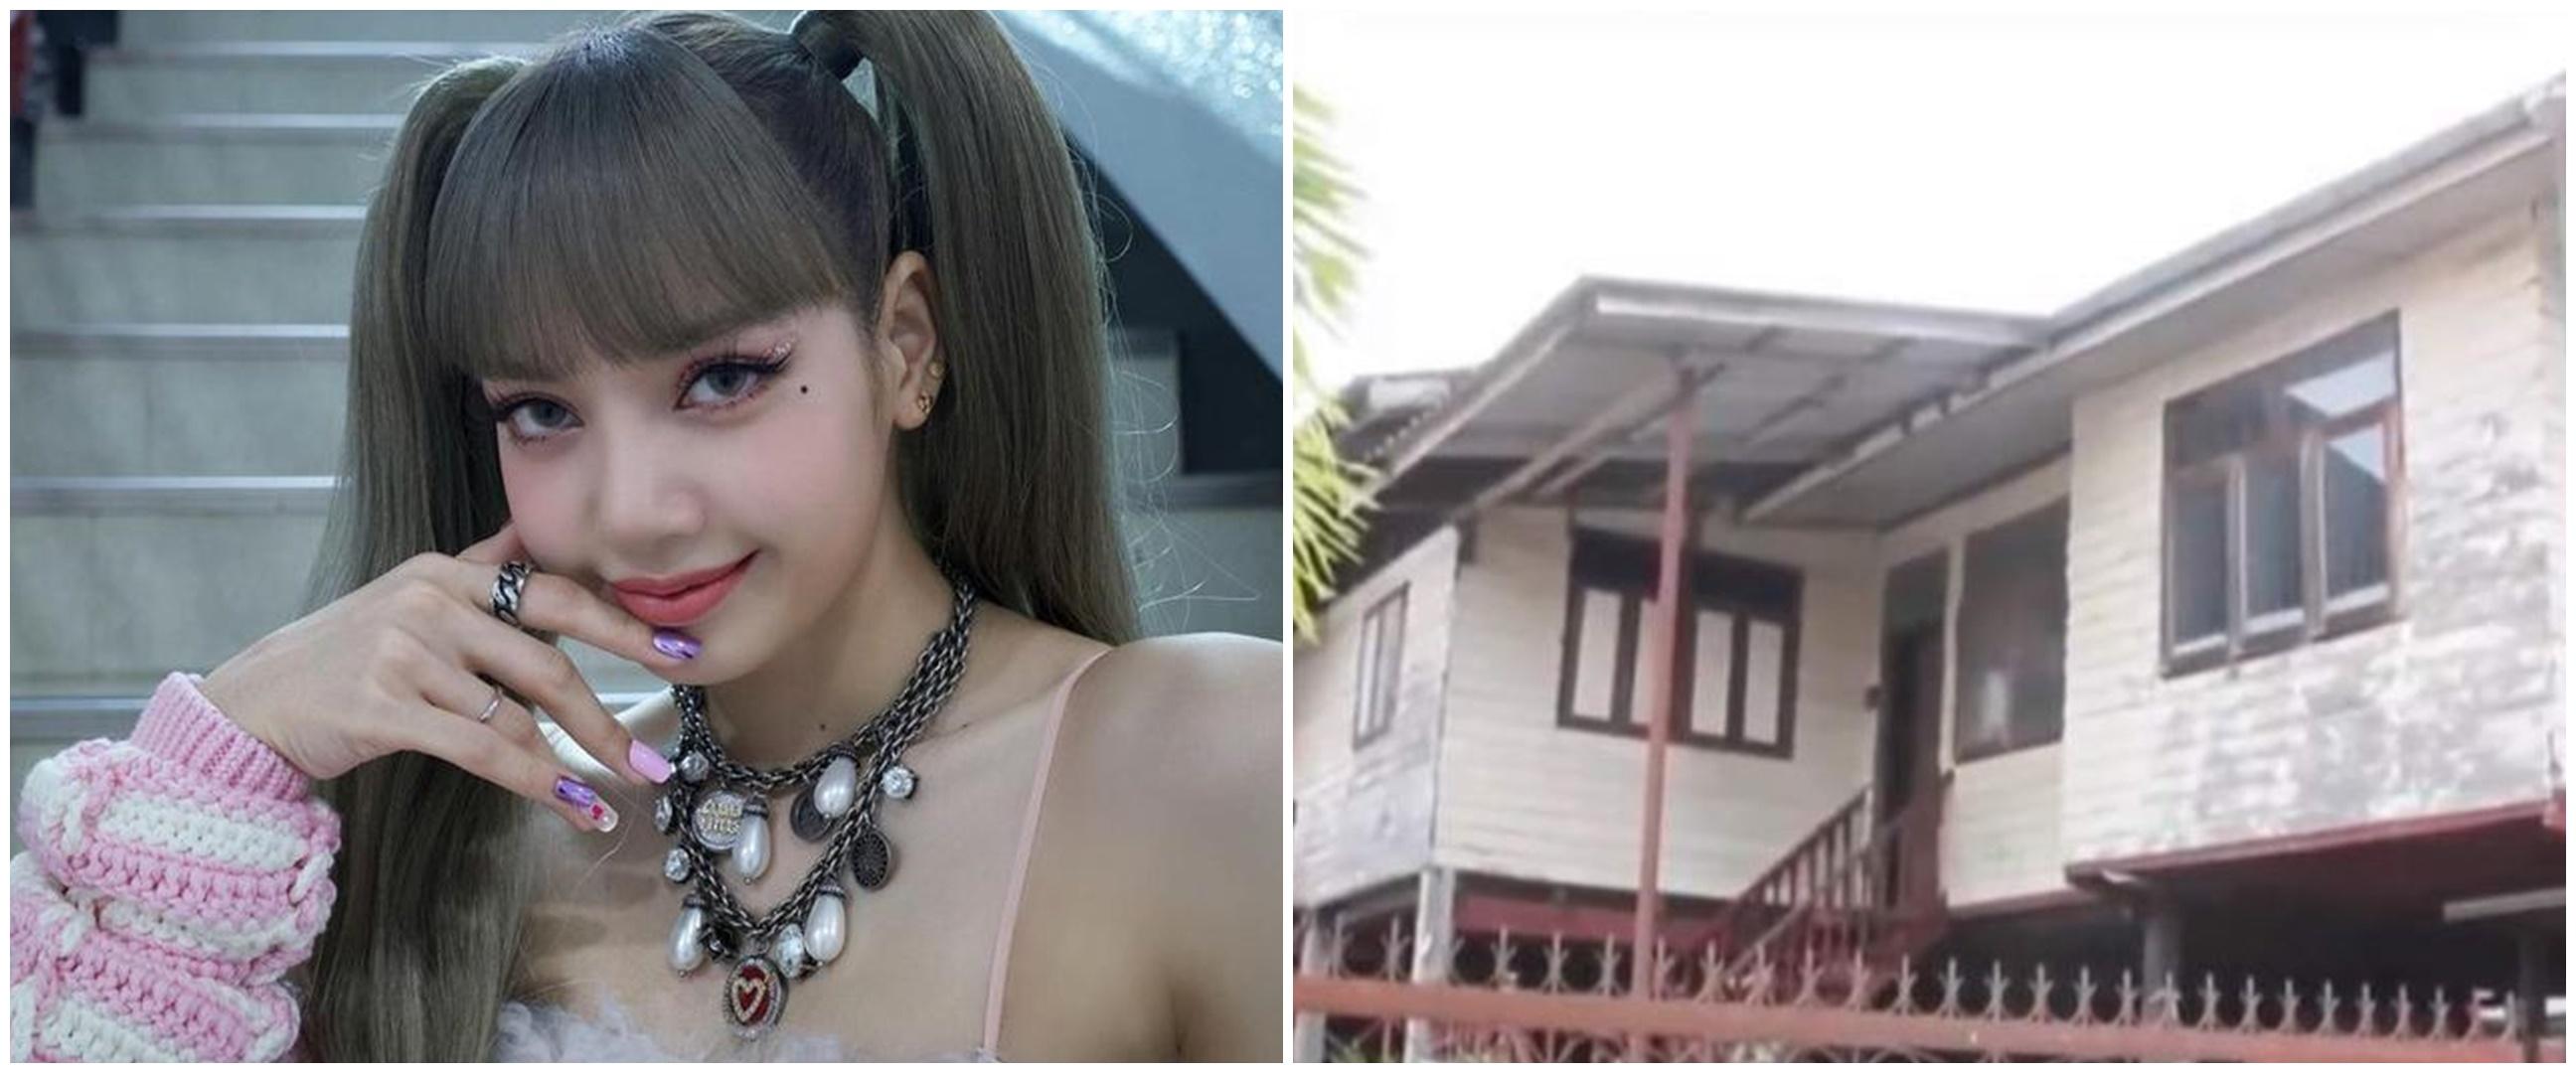 Idol K-Pop termahal, intip 9 potret hunian Lisa Blackpink dulu & kini